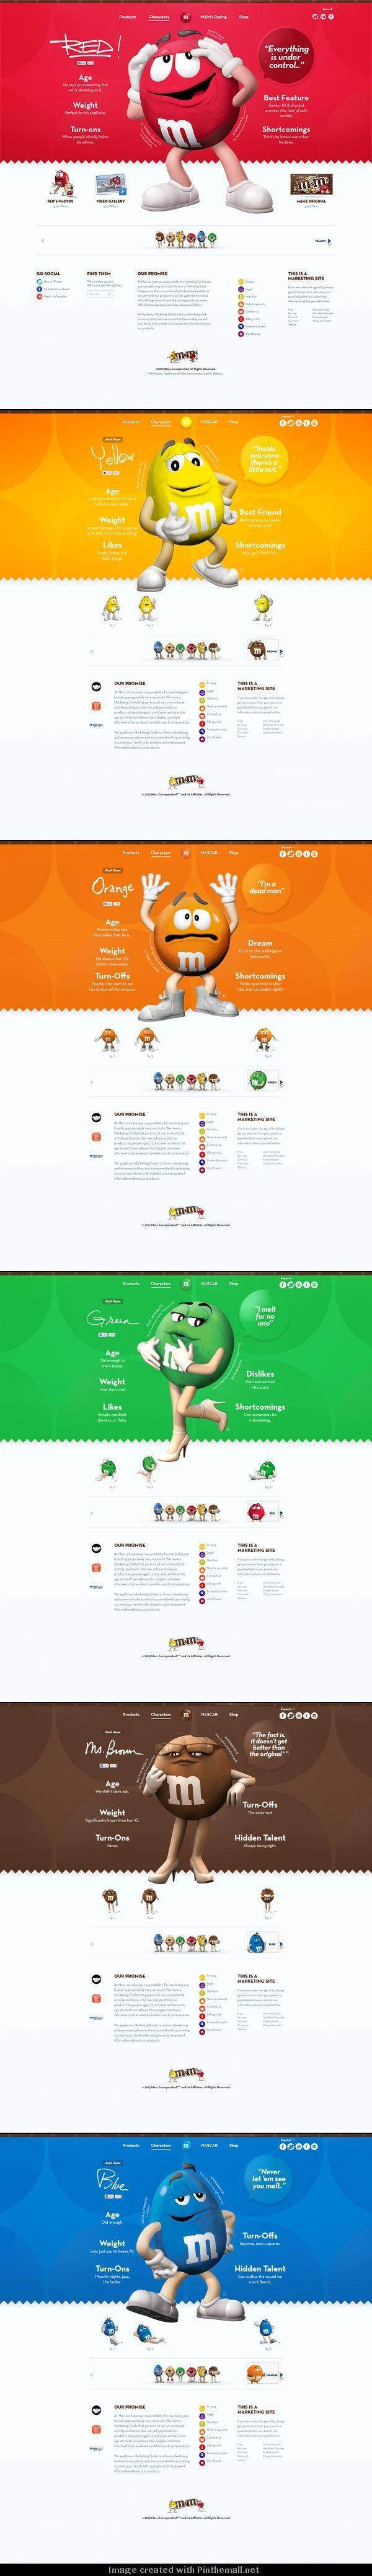 Cool Web Design on the Internet, M&M. #webdesign #webdevelopment #website @ http://www.pinterest.com/alfredchong/web-design/: